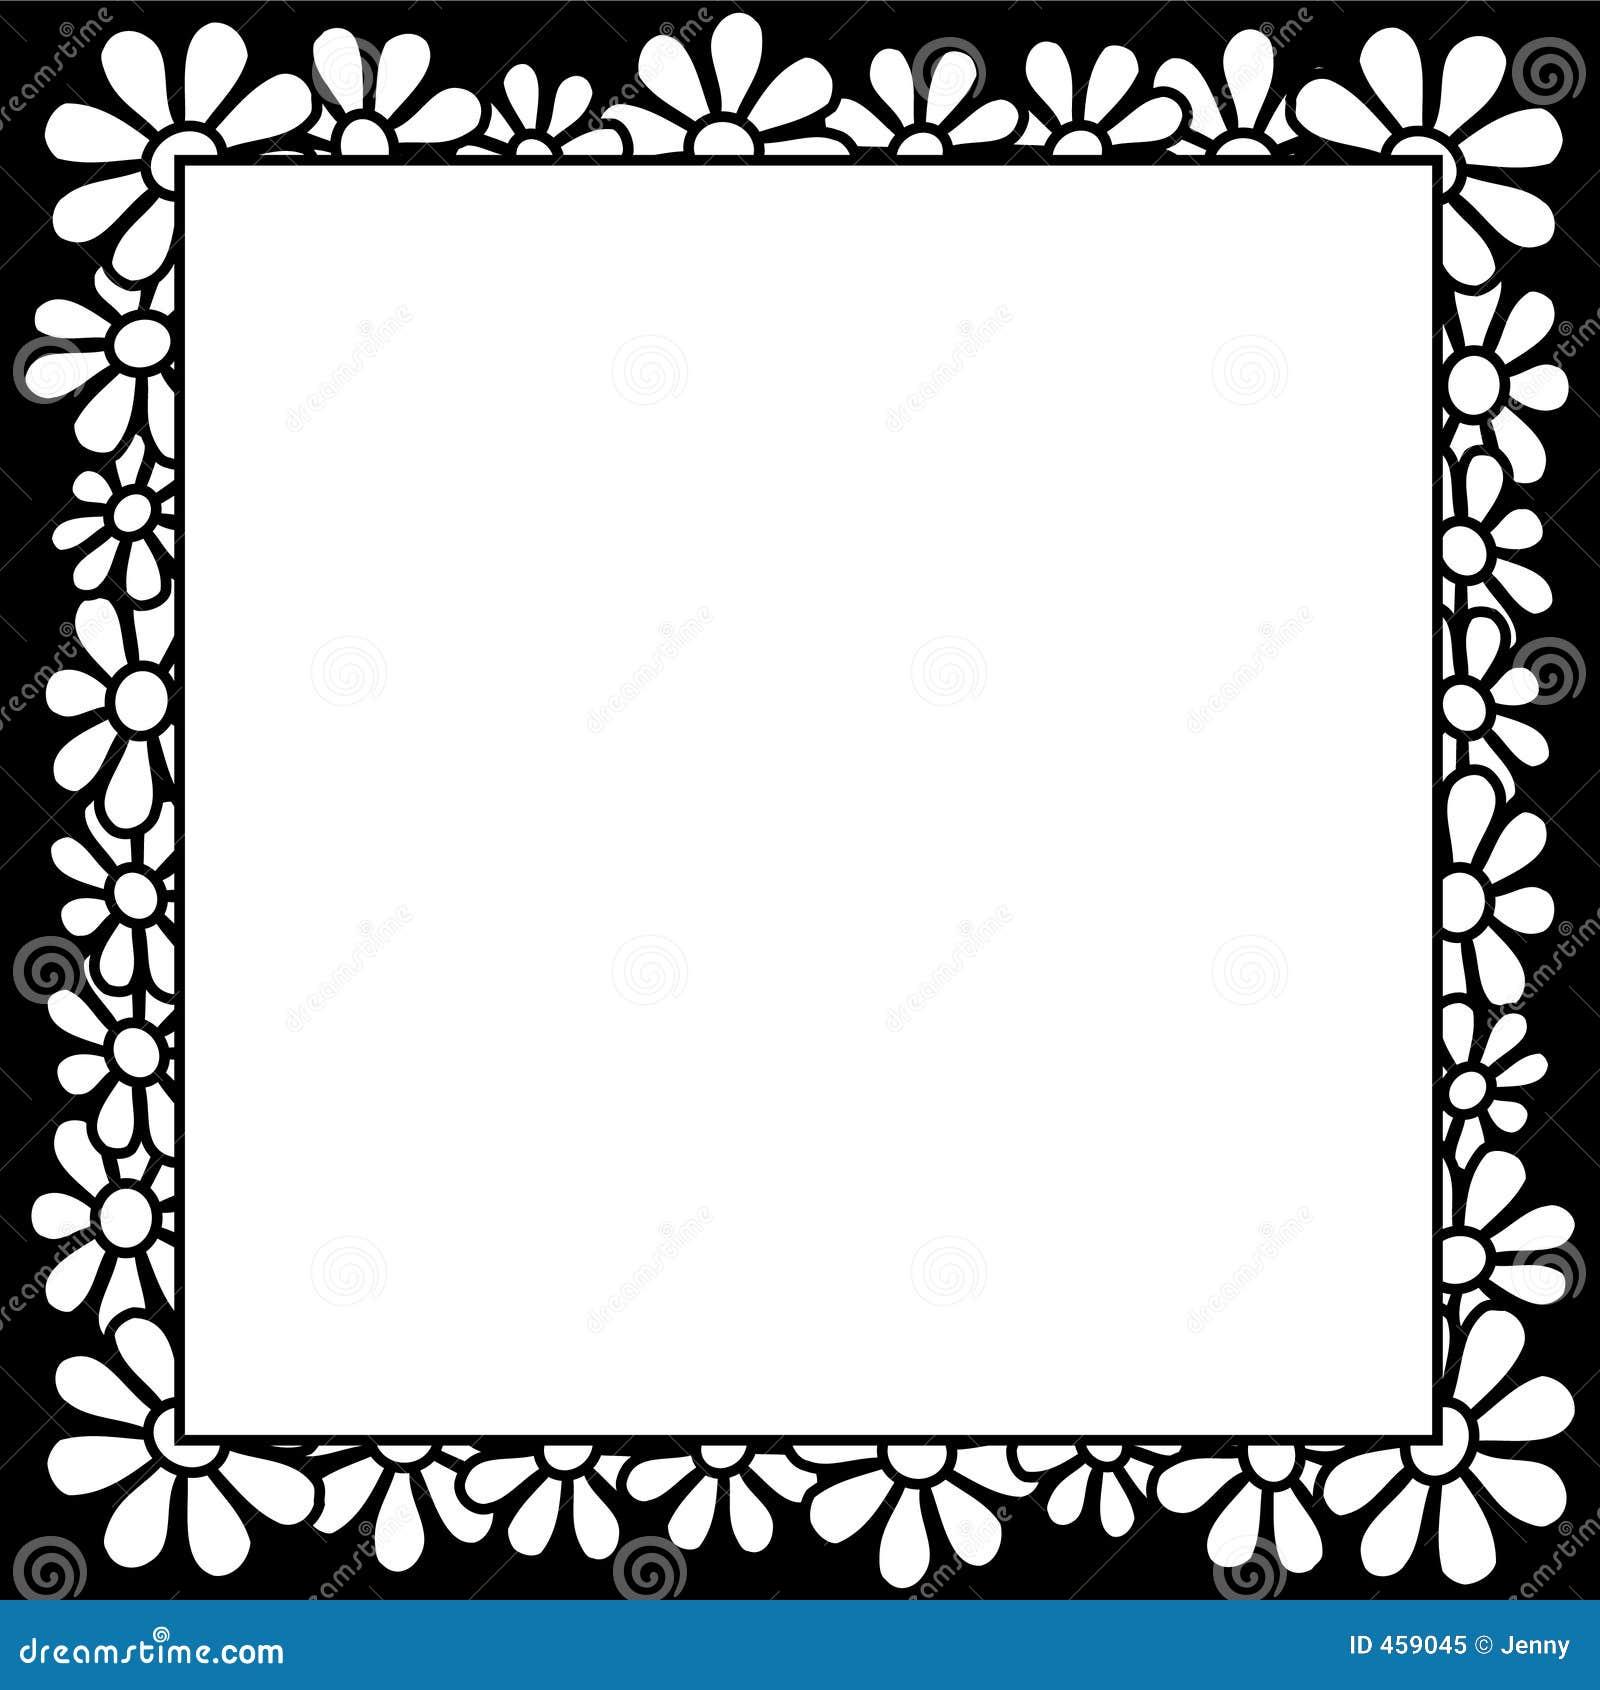 Download Flowers - Border stock vector. Illustration of seventies - 459045